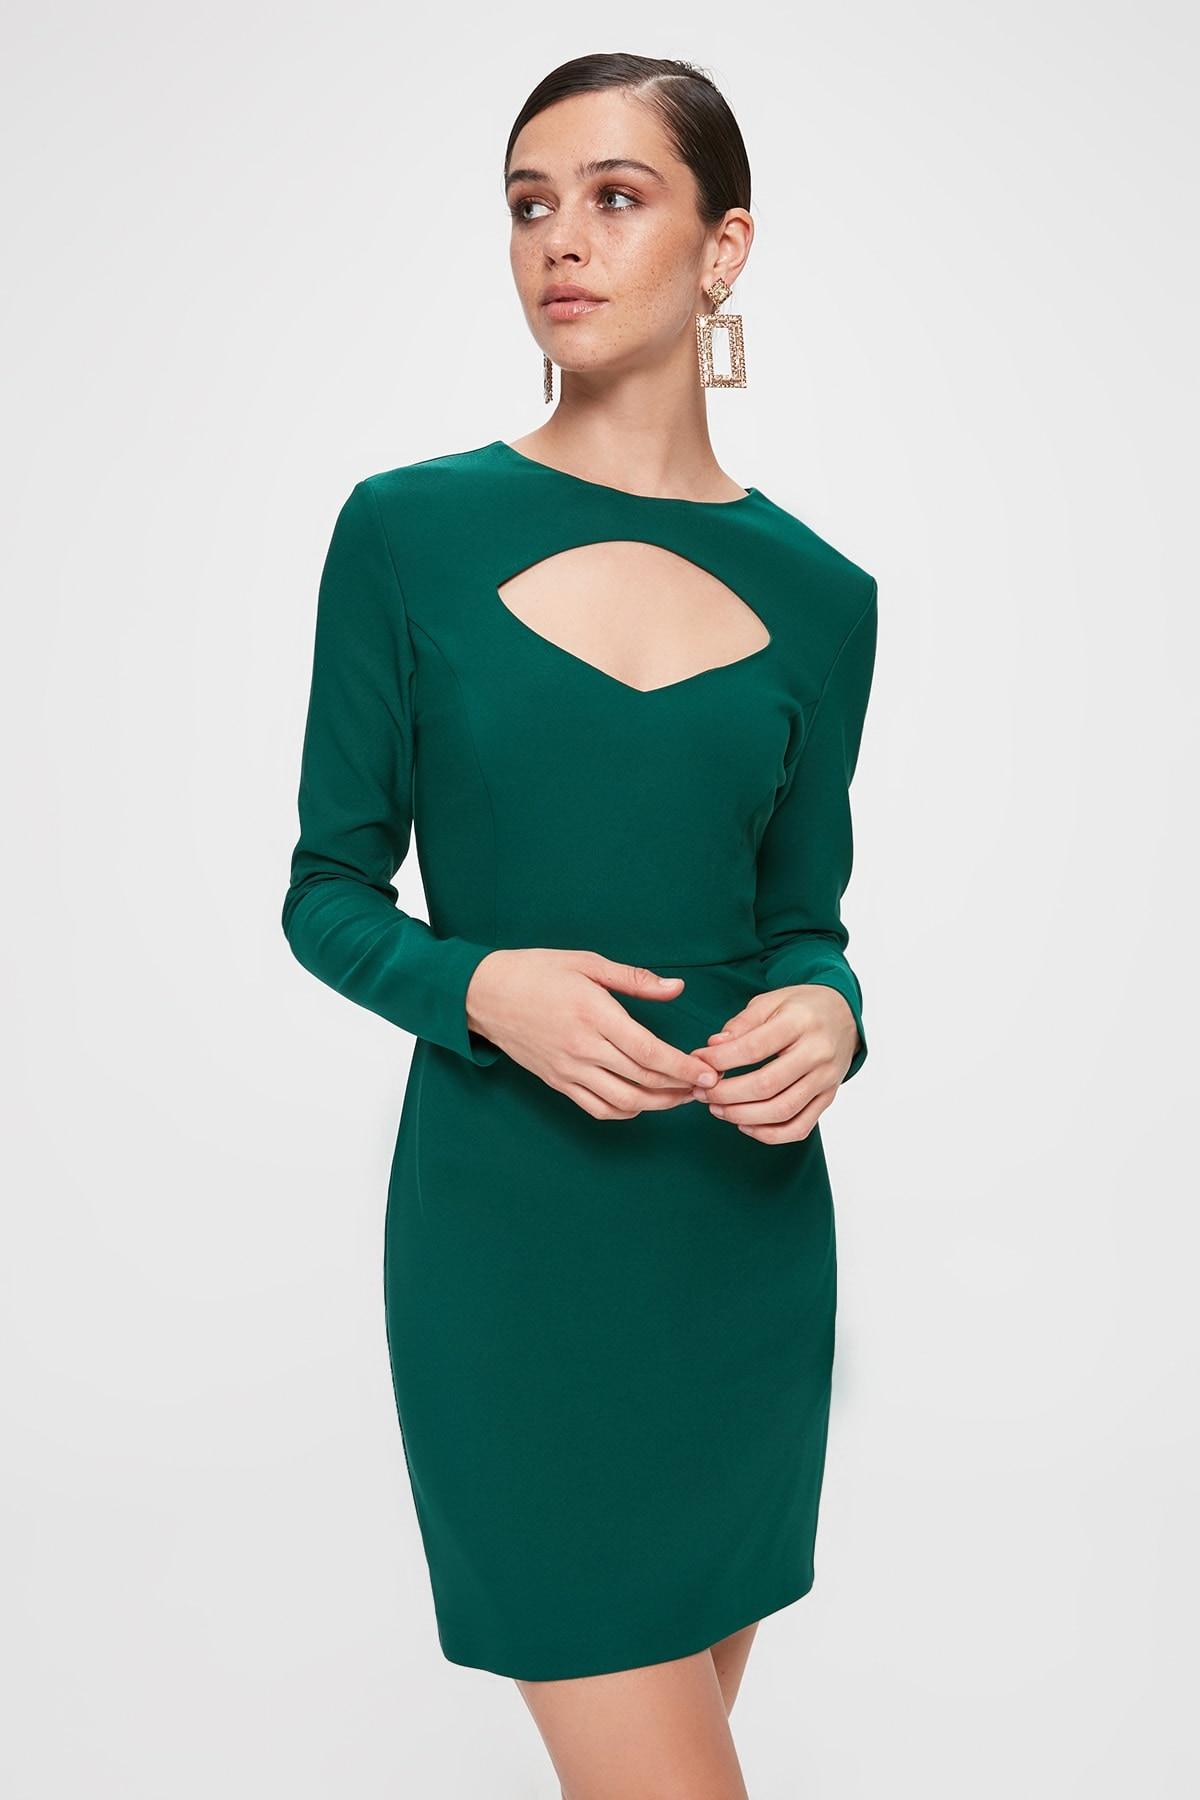 Trendyol Collar Low-Cut Dress TPRAW20EL1959